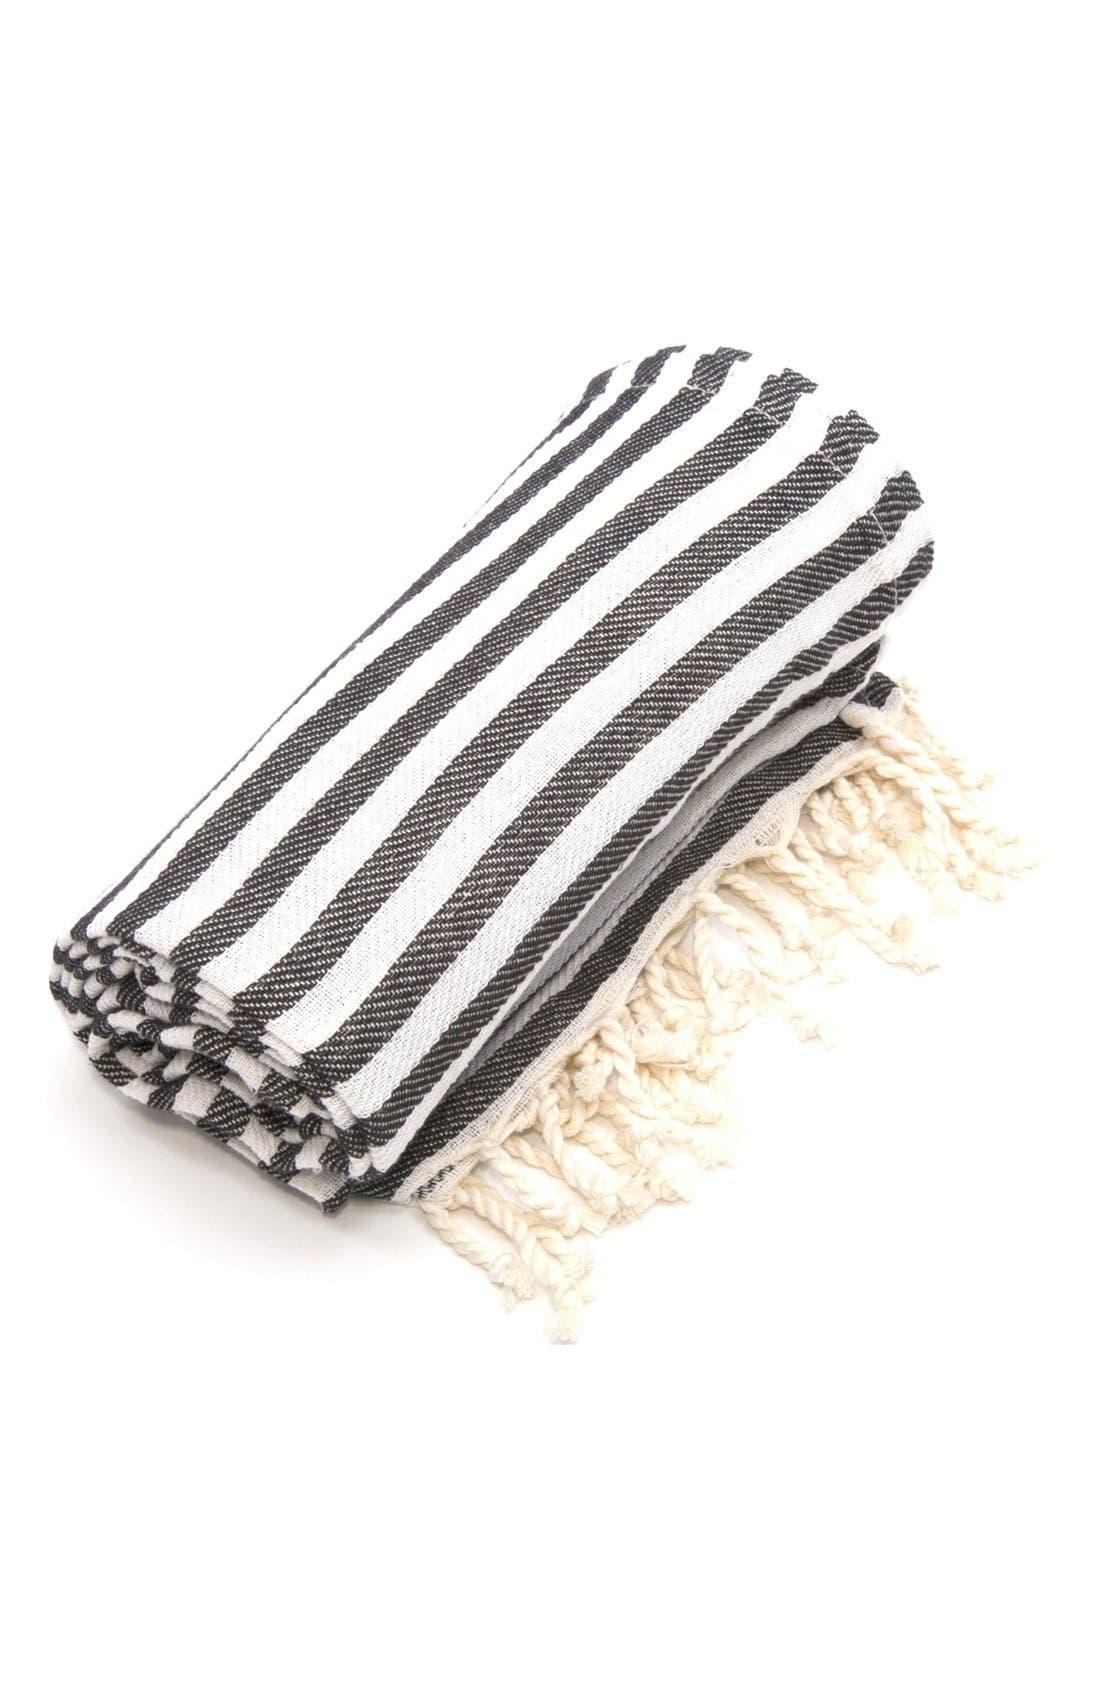 'Fun in the Sun' Turkish Pestemal Towel,                             Alternate thumbnail 3, color,                             CHARCOAL BLACK